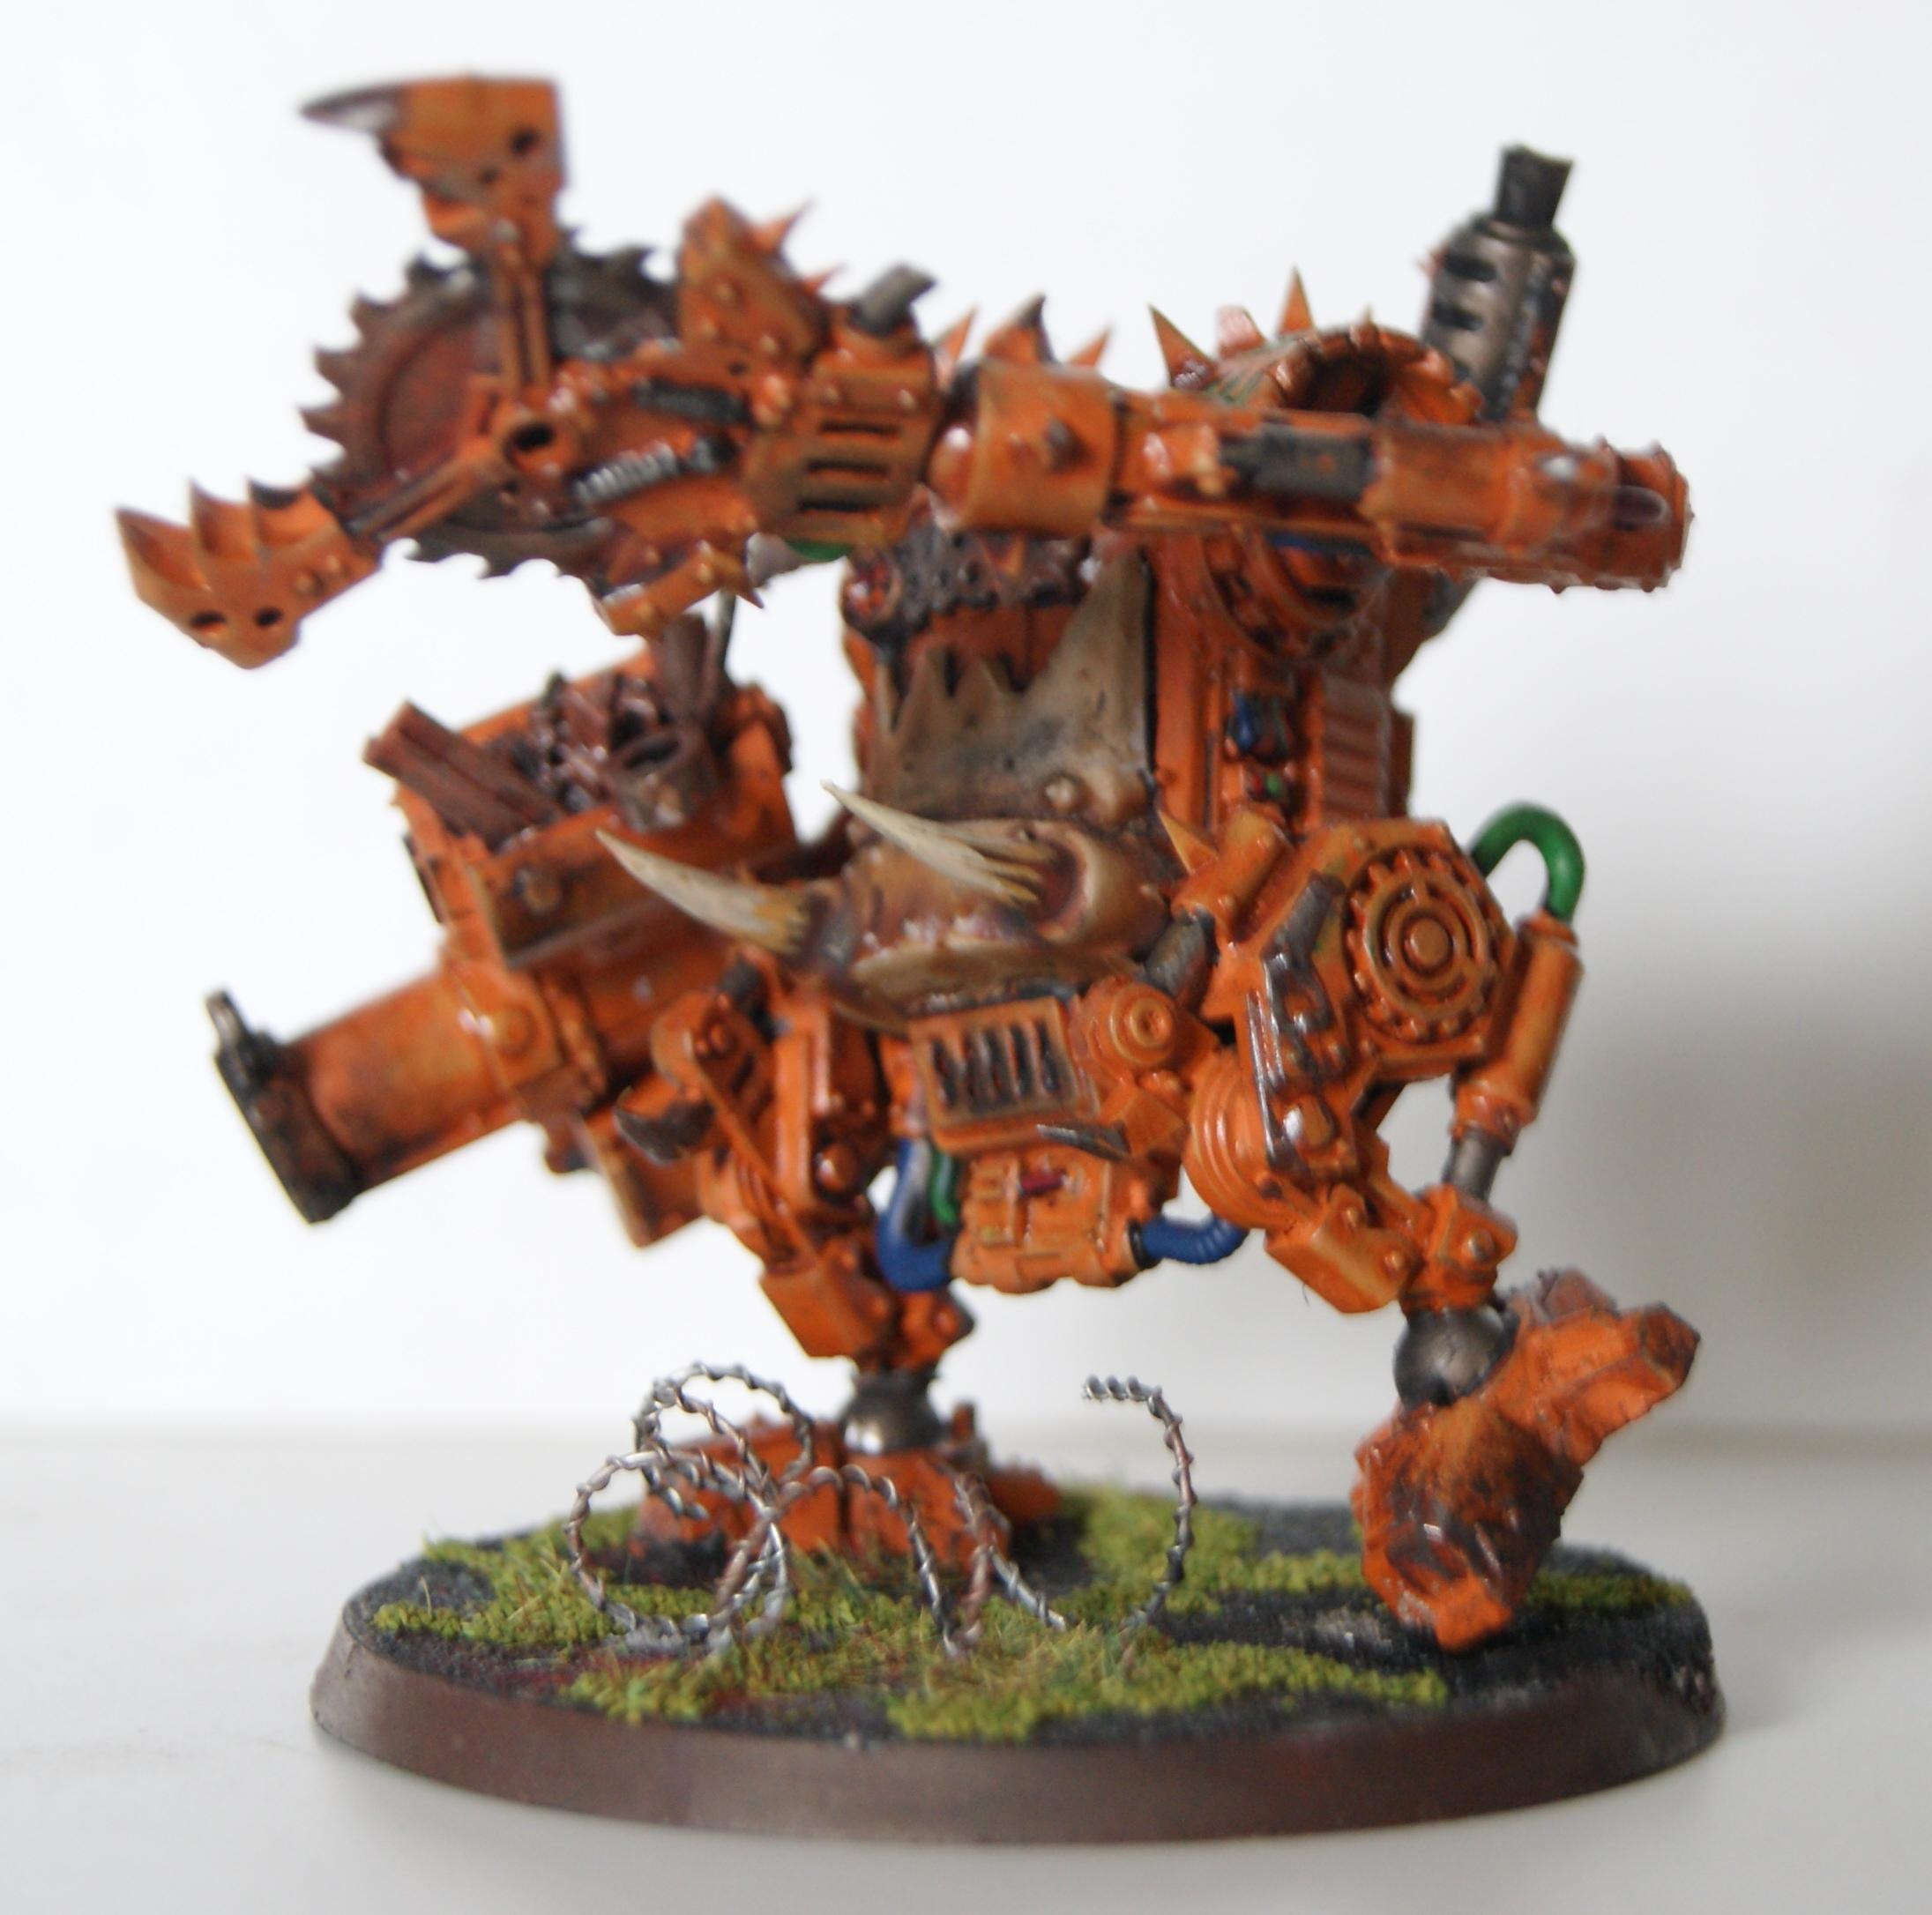 Conversion, Grot Rebellion, Grot Rebels, Killa Kan, Warhammer 40,000